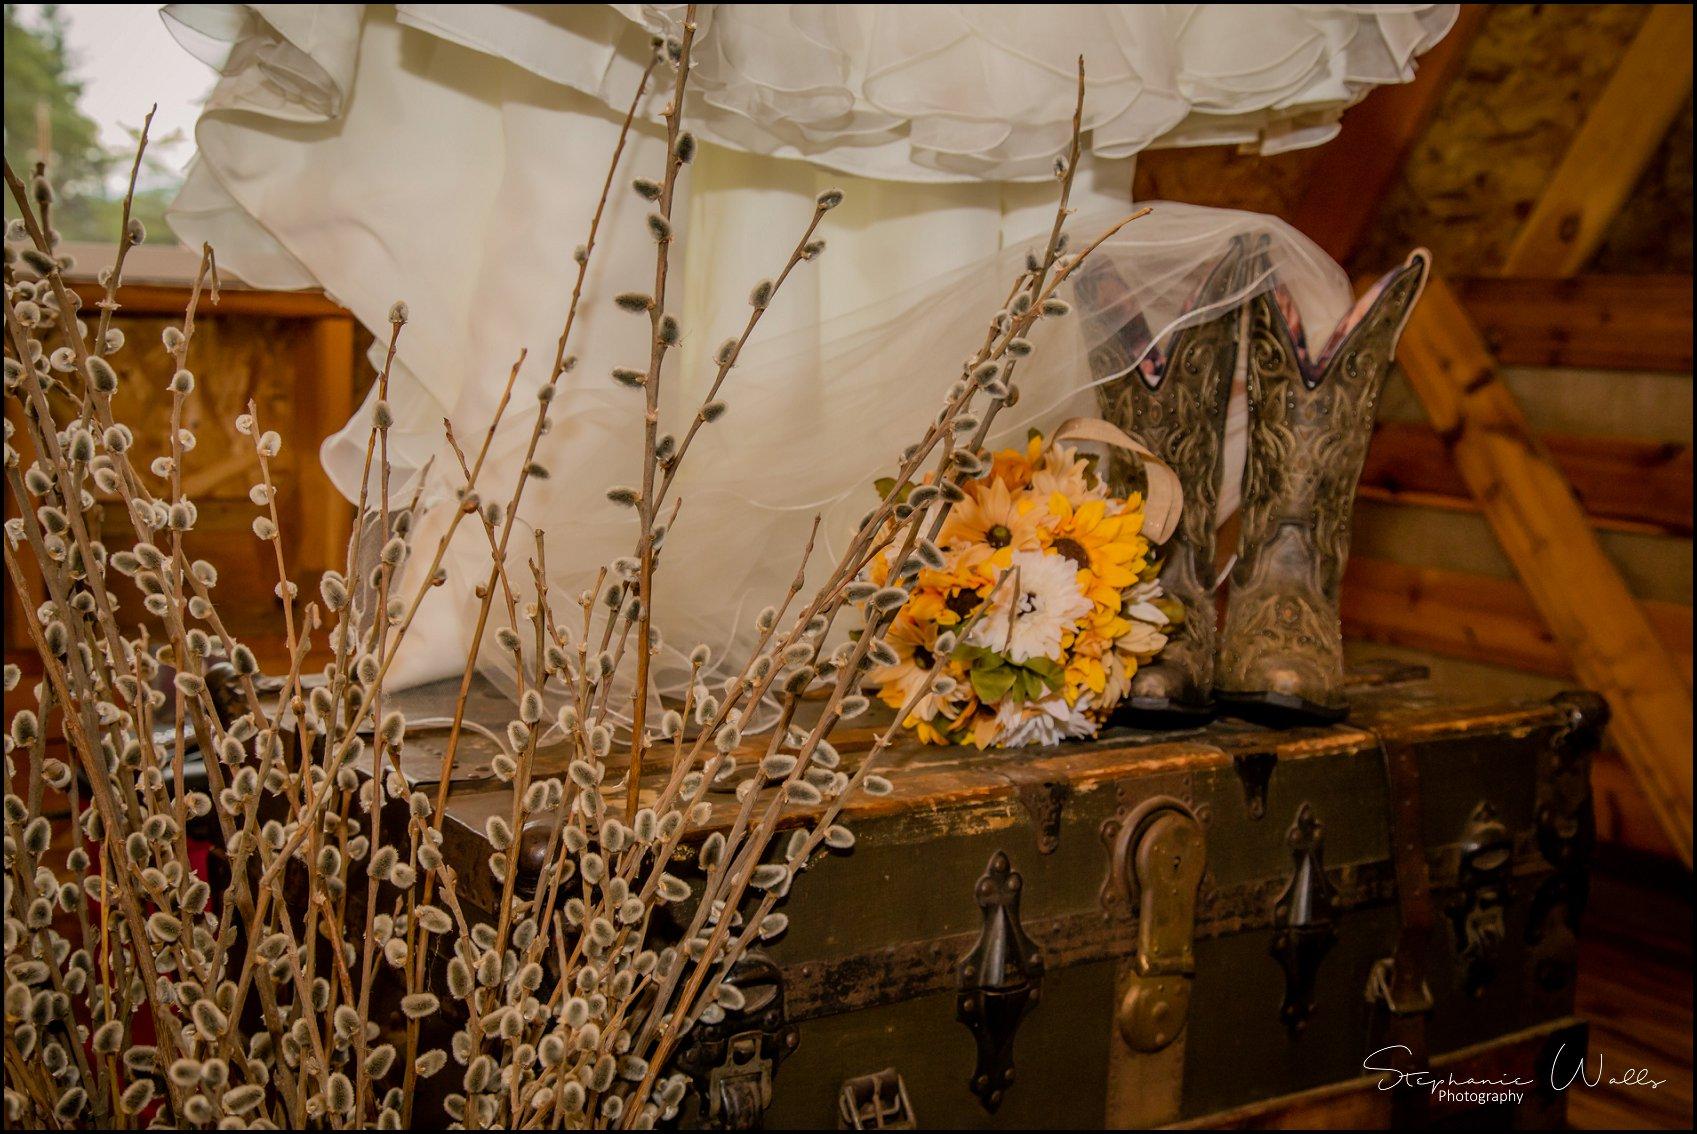 Kimble Wedding 064 Marlena & Allans | Snohomish Red Barn Events (Stocker Farms) | Snohomish, Wa Wedding Photographer